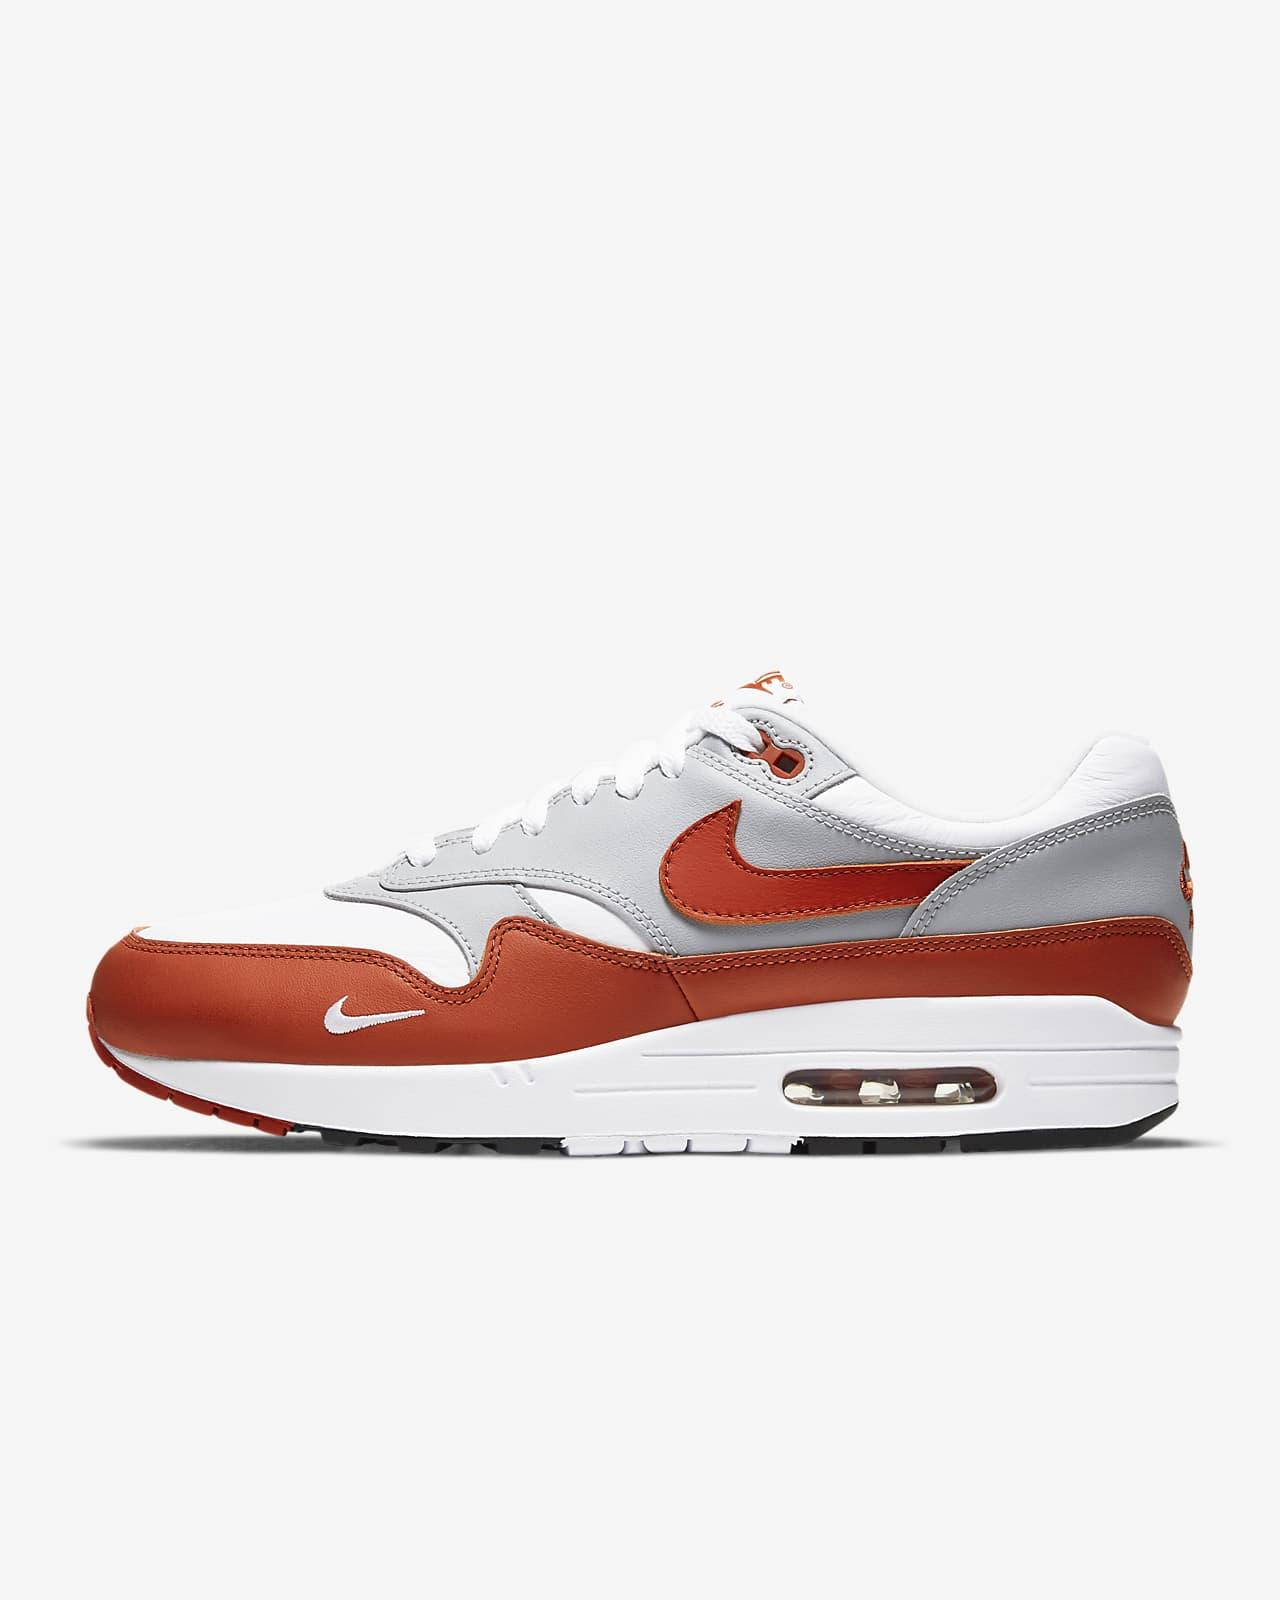 Nike Air Max 1 LV8 Men's Shoes